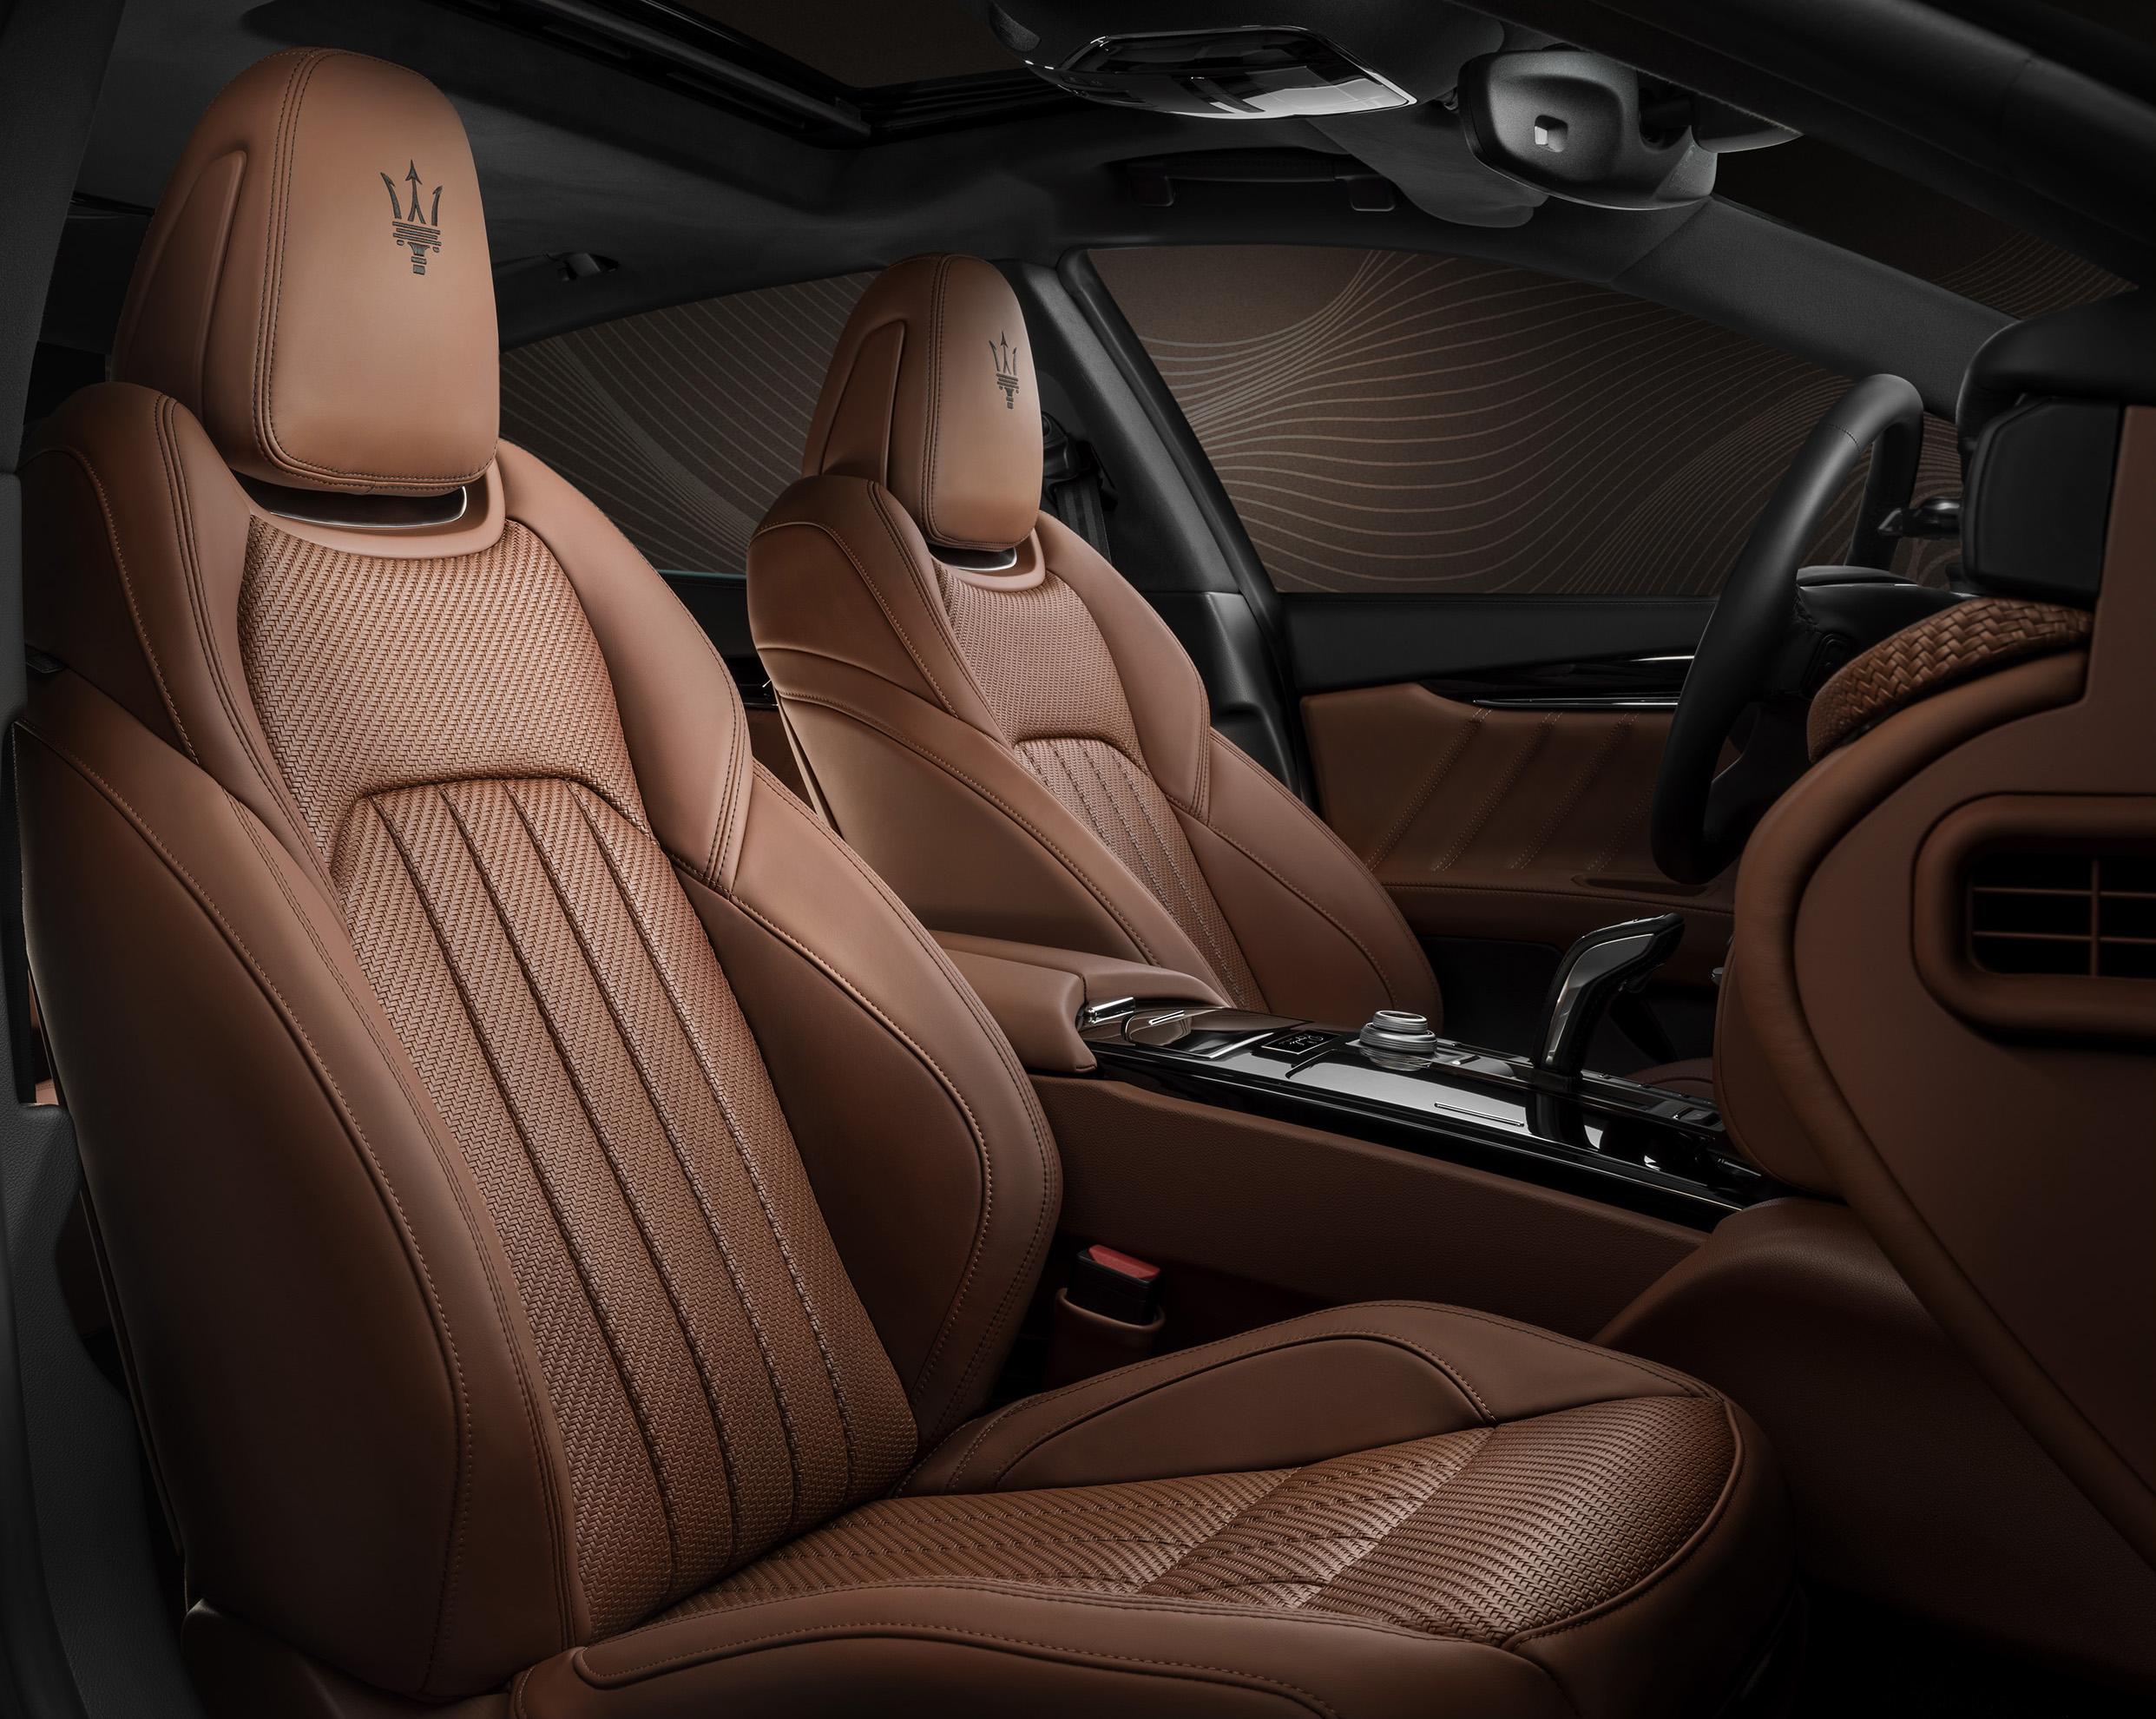 Interior Maserati Quattroporte GranLusso Royale M156 2020 2484x1980